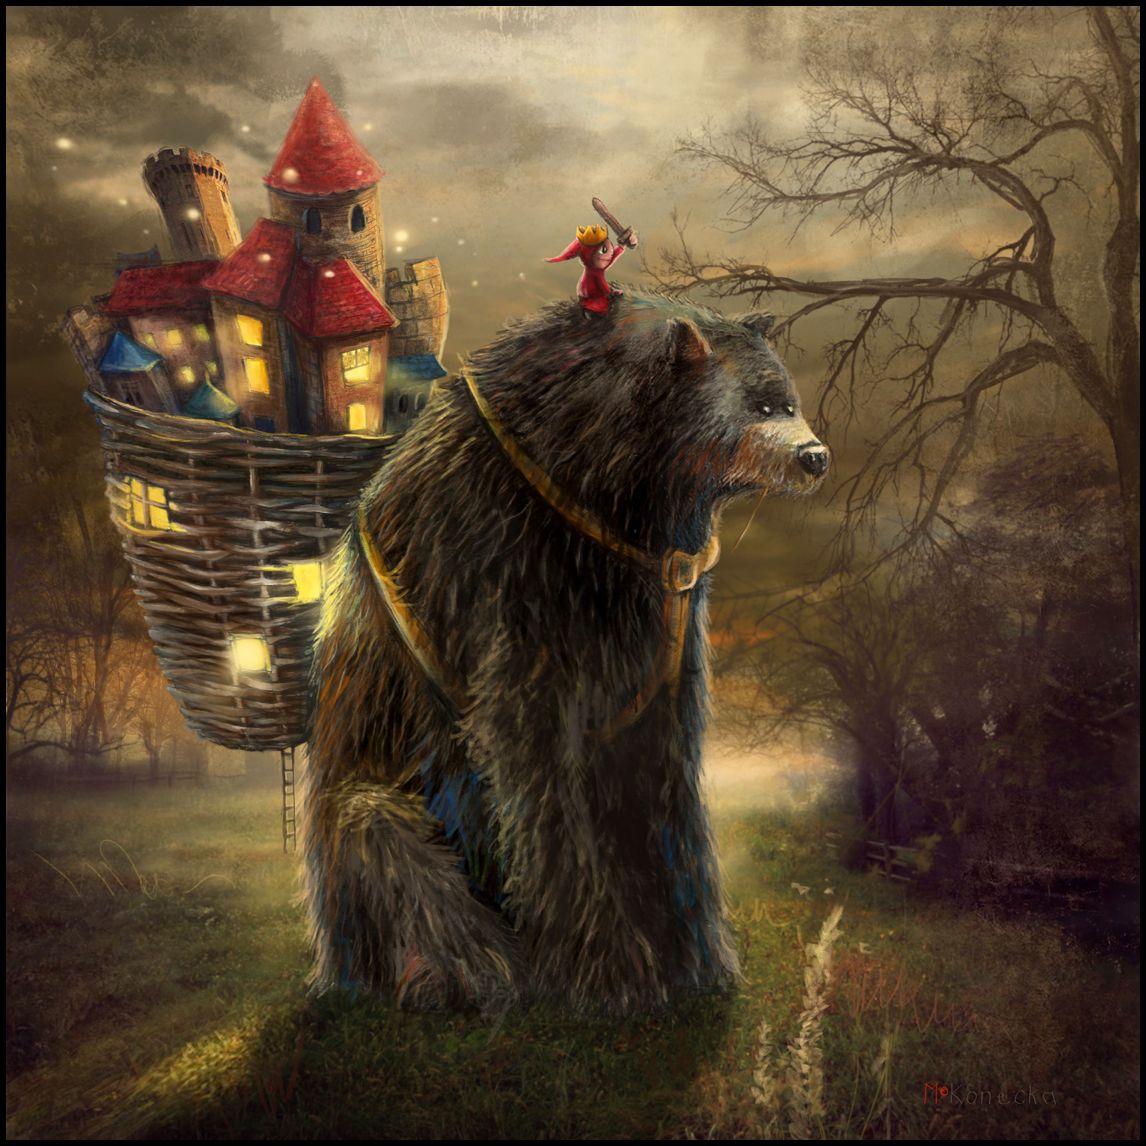 """A Bear Who Carried A Kingdom"" Edinburgh Castle, Scotland. Matylda Konecka www.matyldakonecka.com  #matyldakonecka  #edinburghcastle  #scotland  #art  #illustration  #bear  #prince  #kingdom  #fairytale  #fantasy"